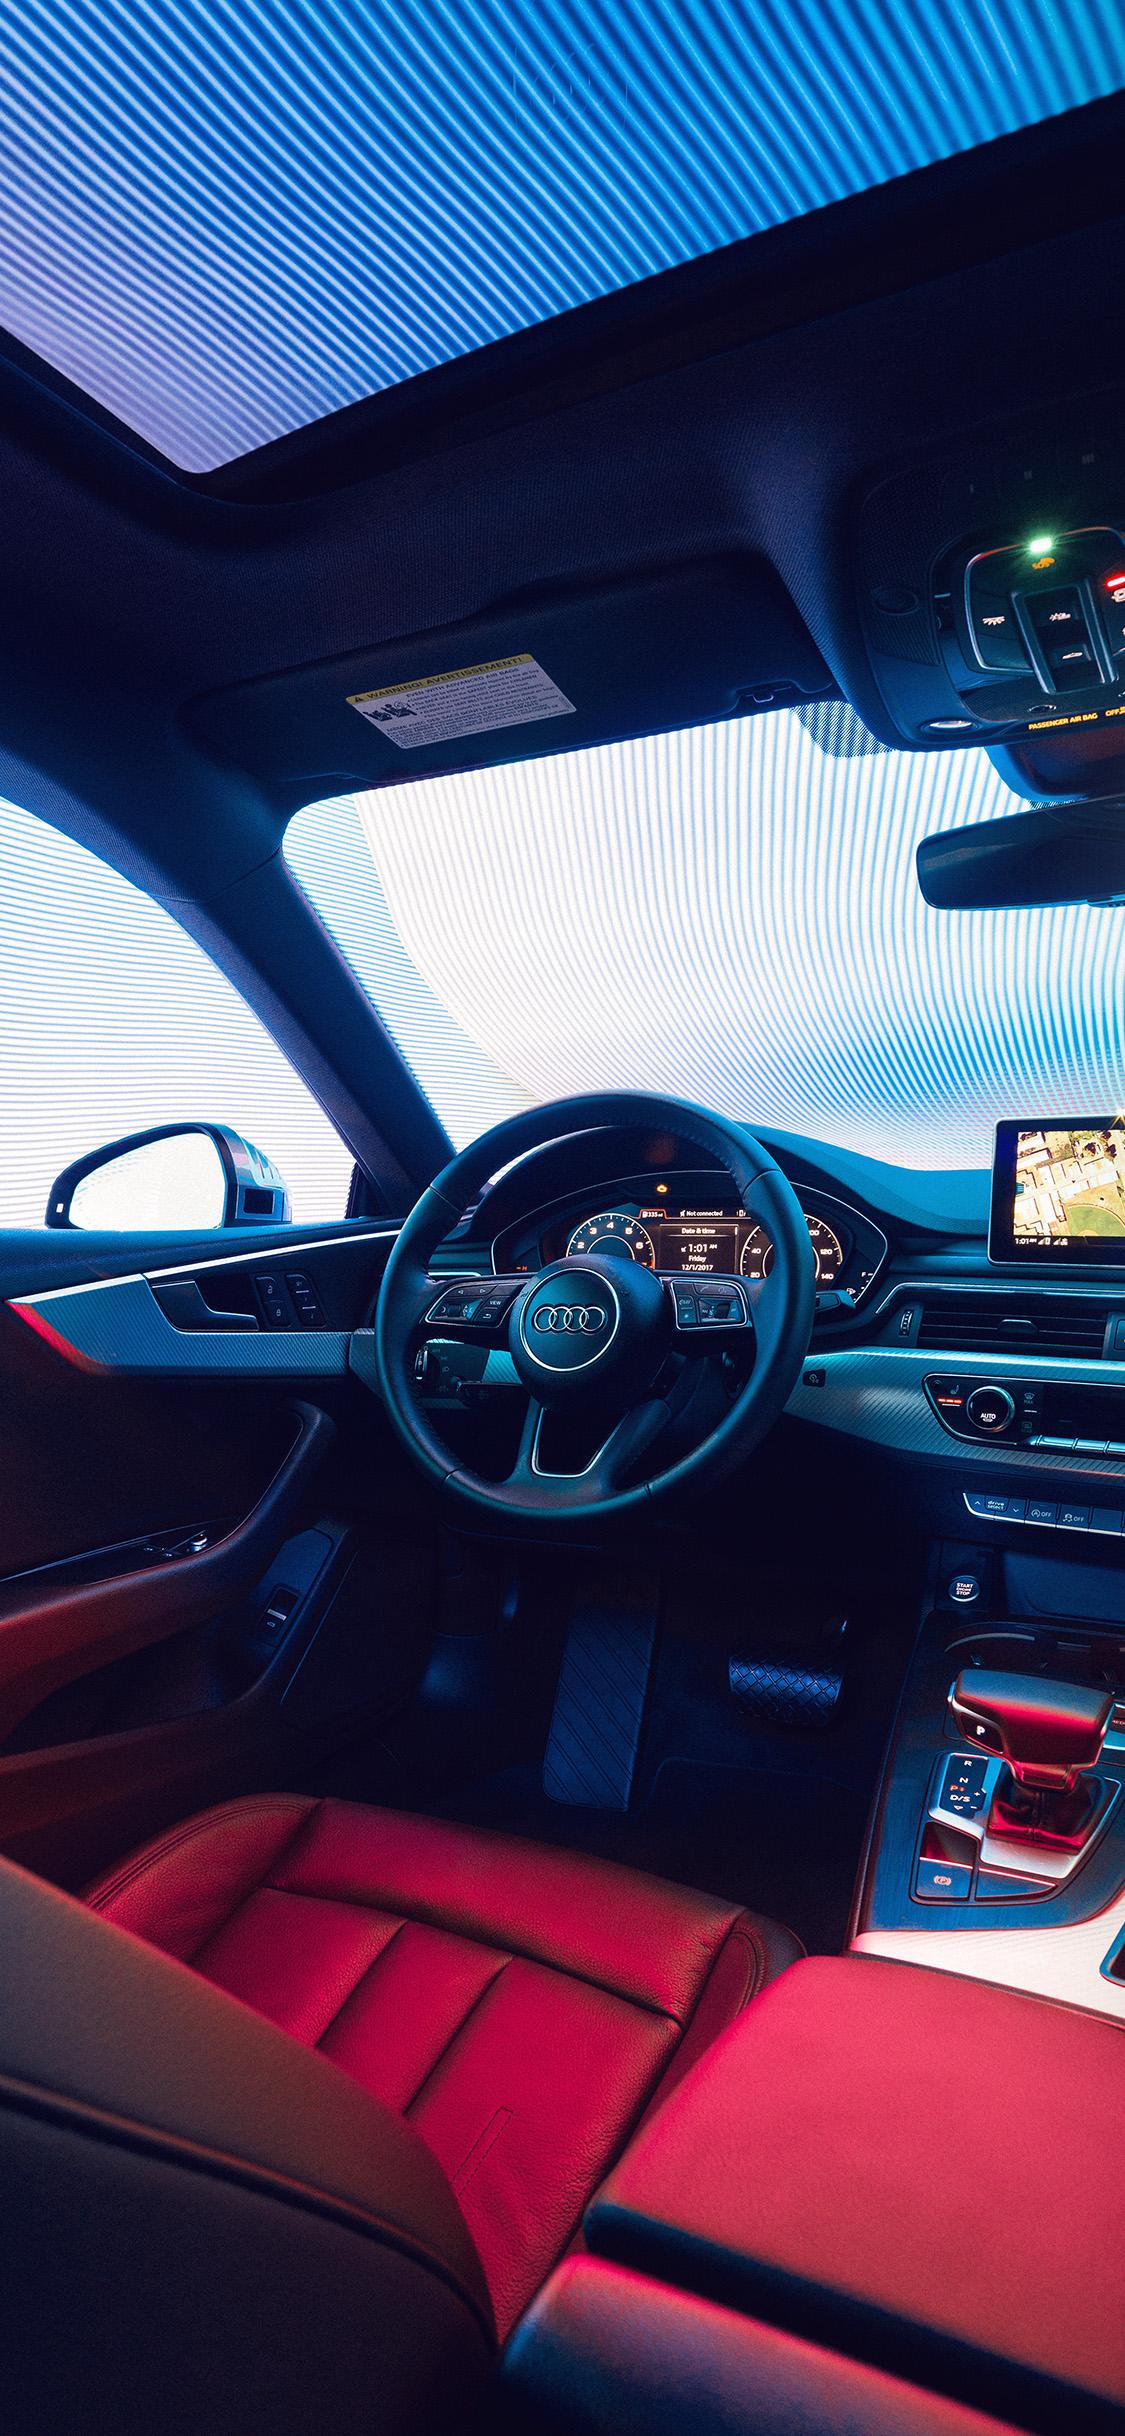 iPhonexpapers.com-Apple-iPhone-wallpaper-be59-car-interior-drive-art-illustration-blue